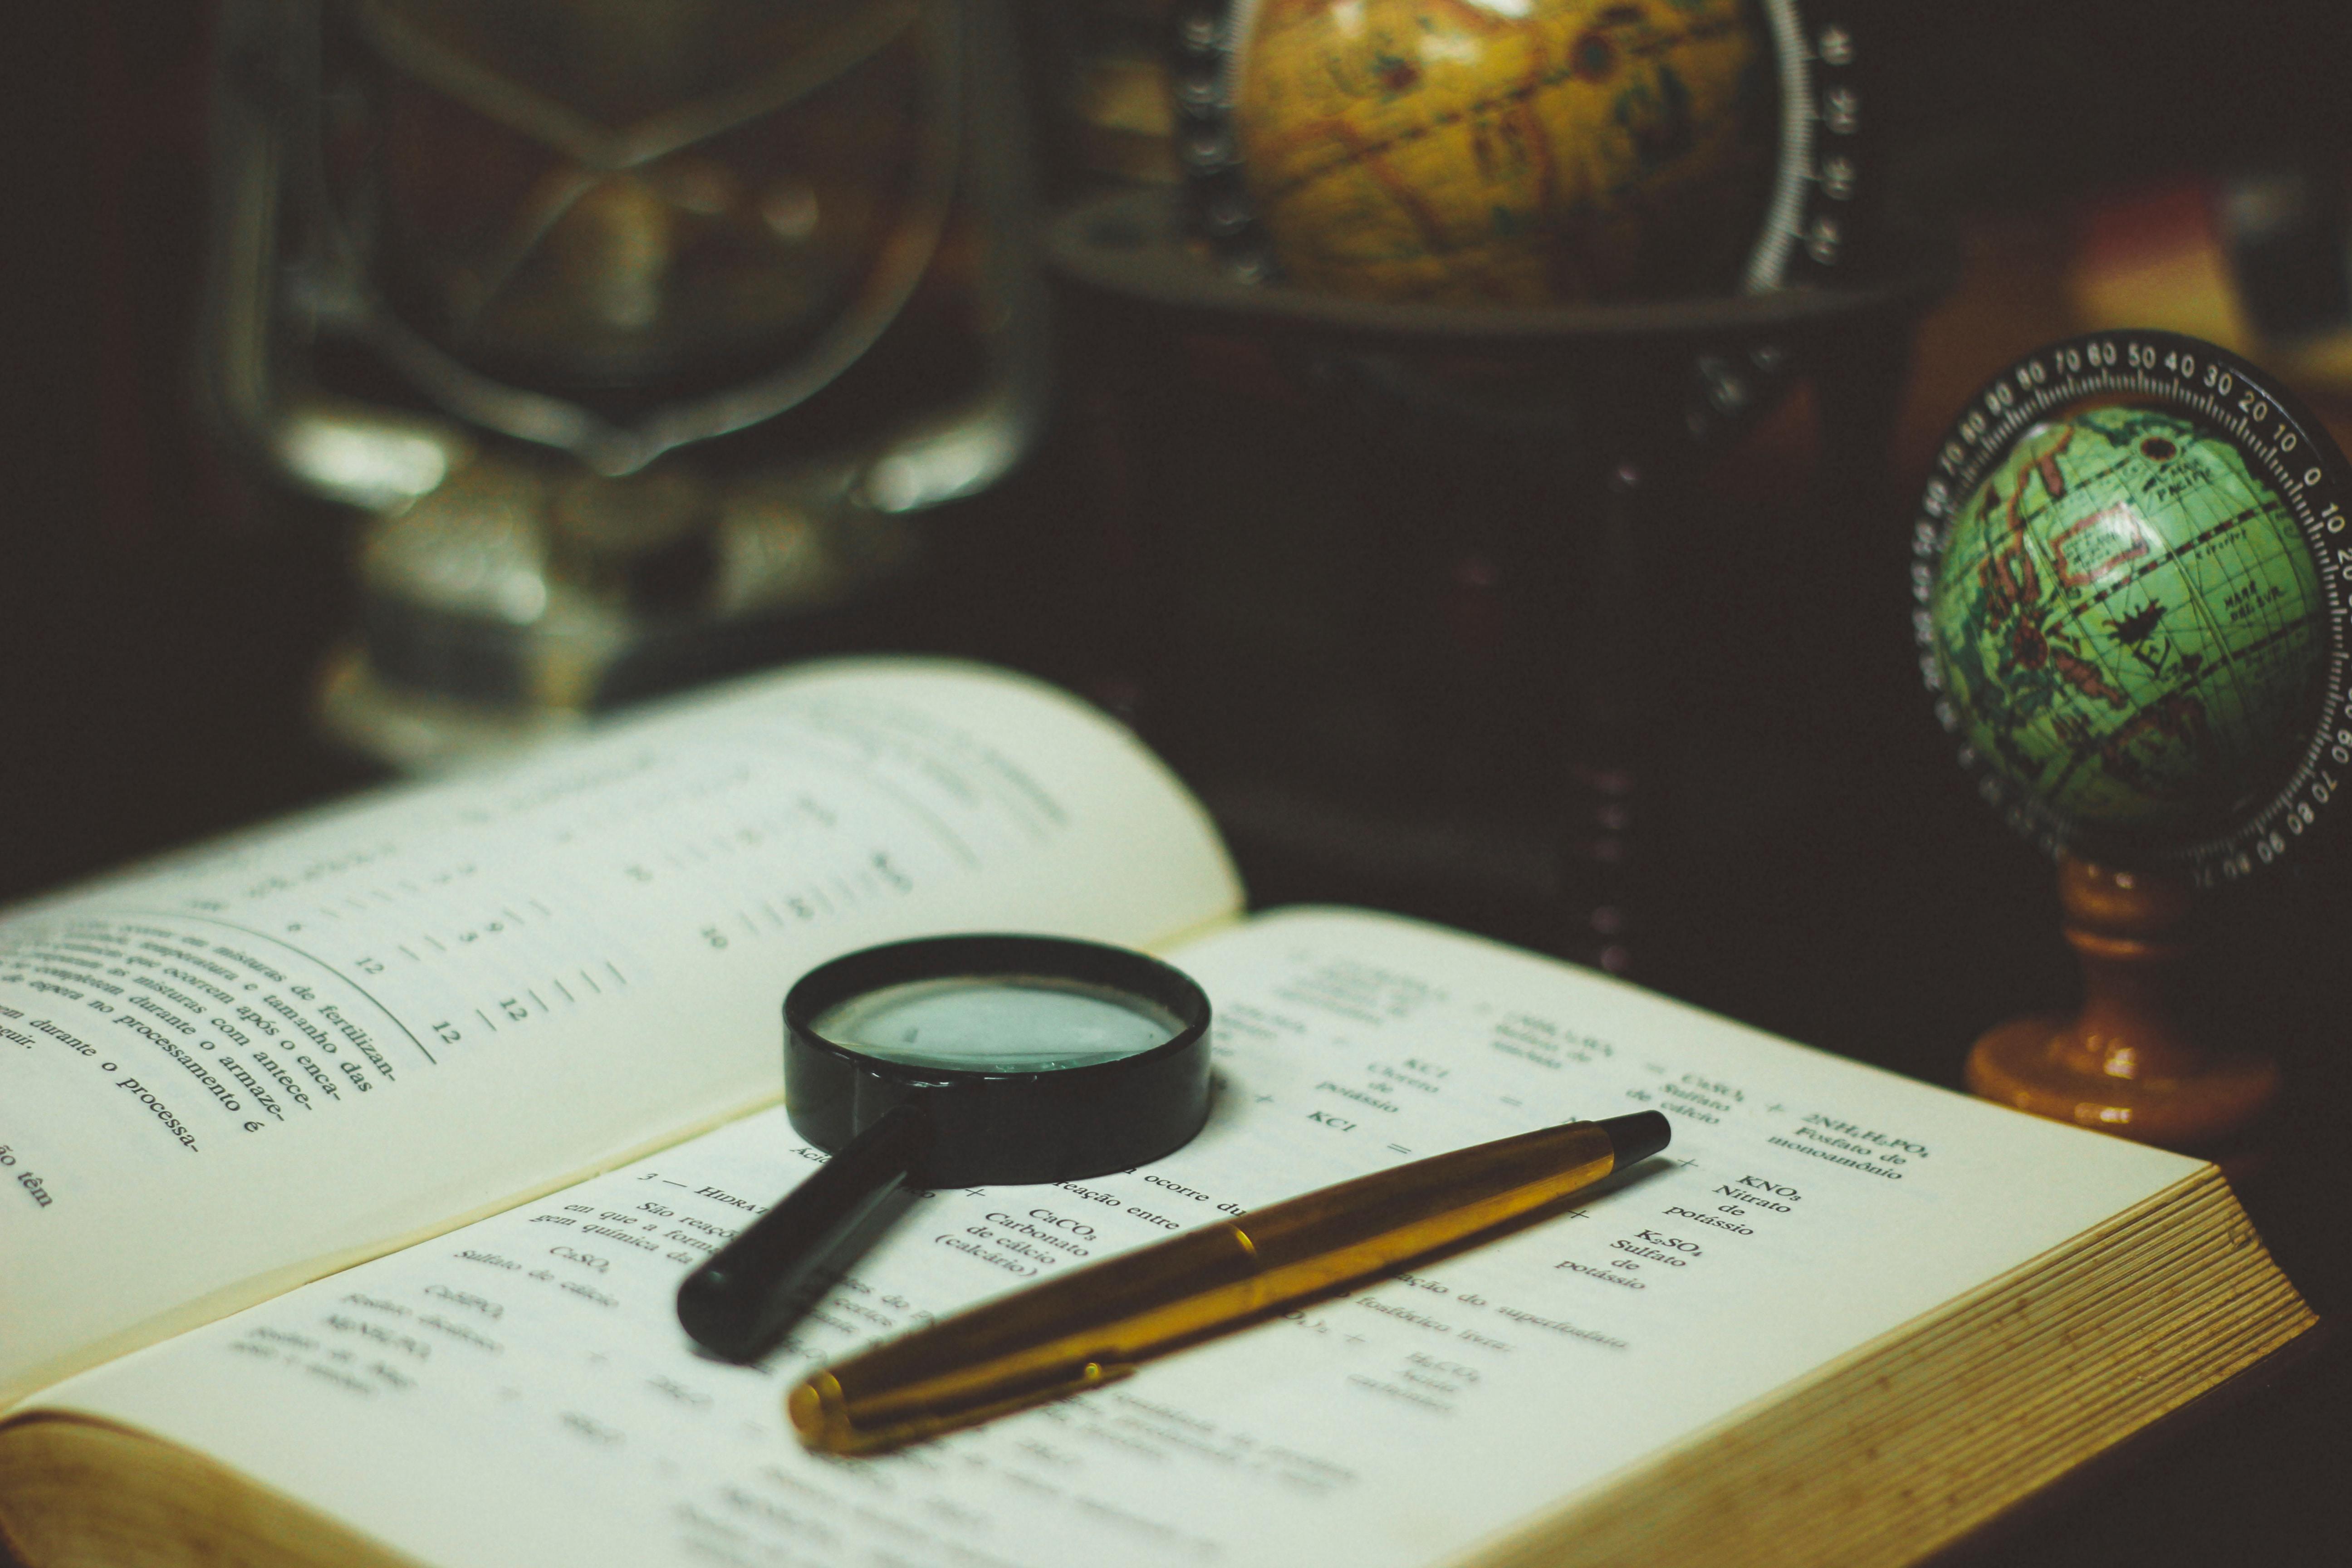 Horizons International translates Christian resources into regional languages